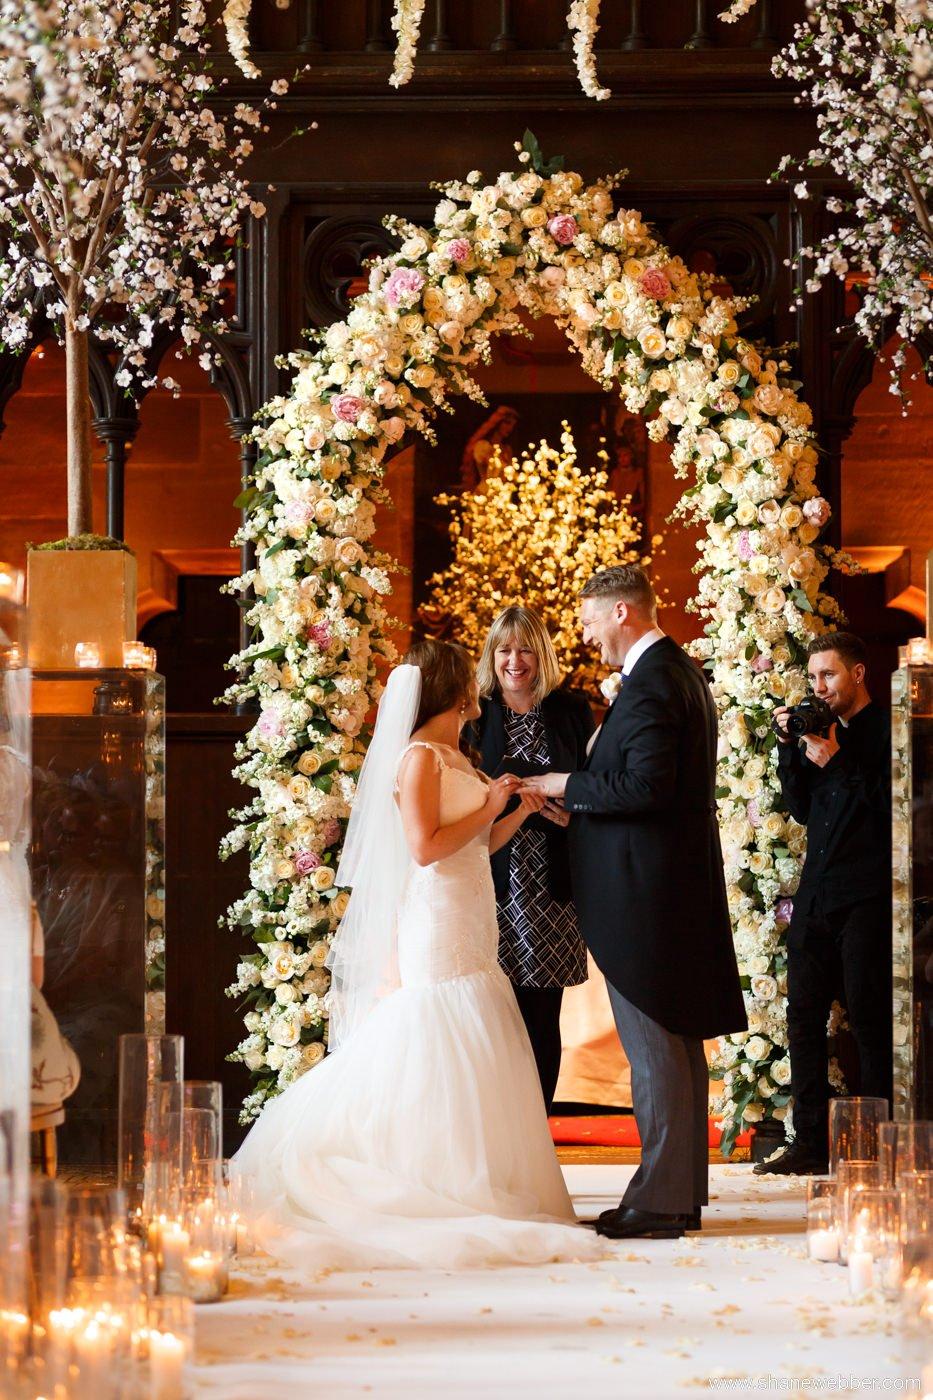 Weddings at Peckforton